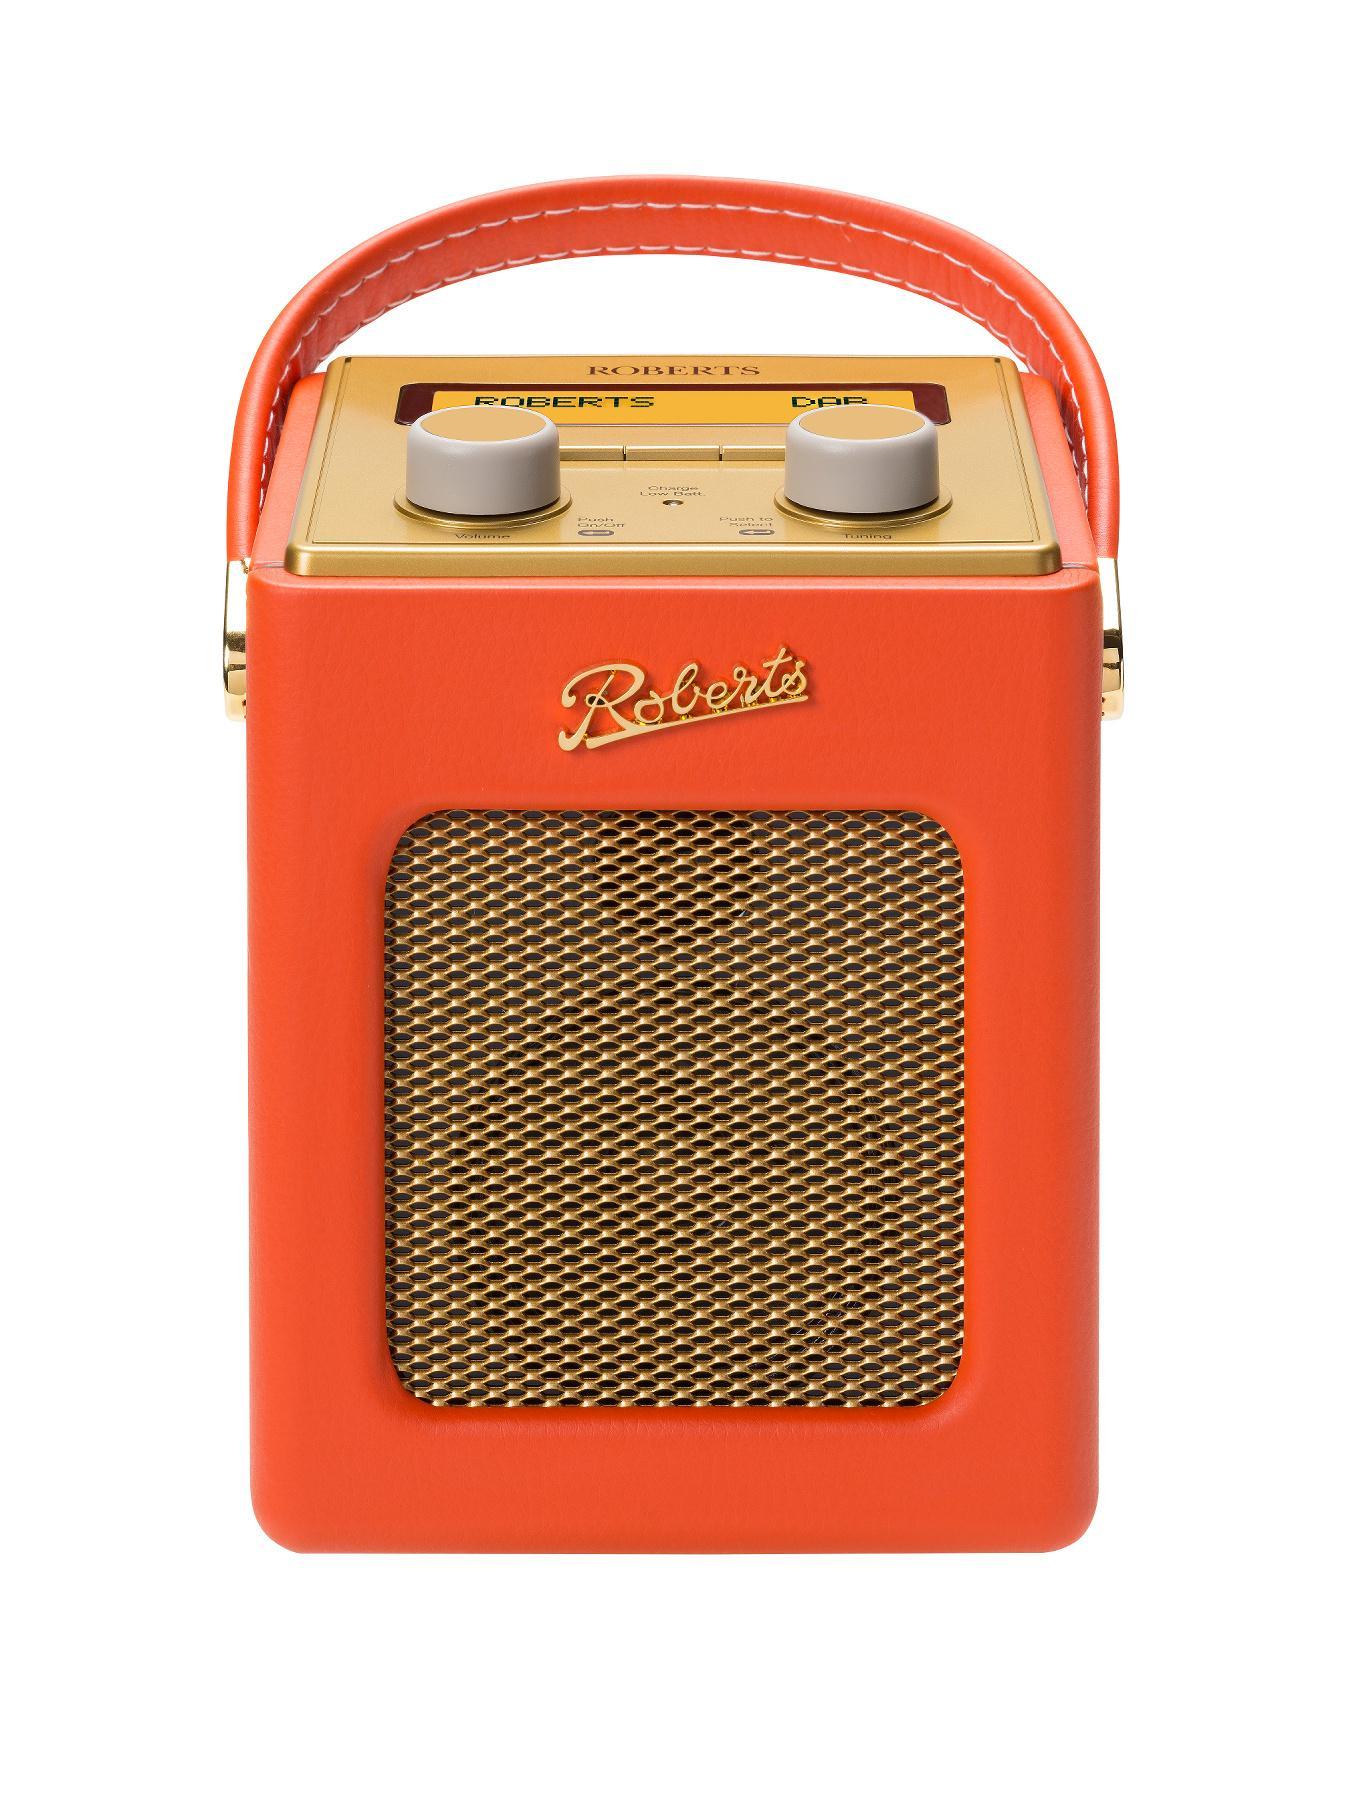 Roberts Mini Revival DAB DAB+ FM Digital Radio - Orange - Orange, Orange